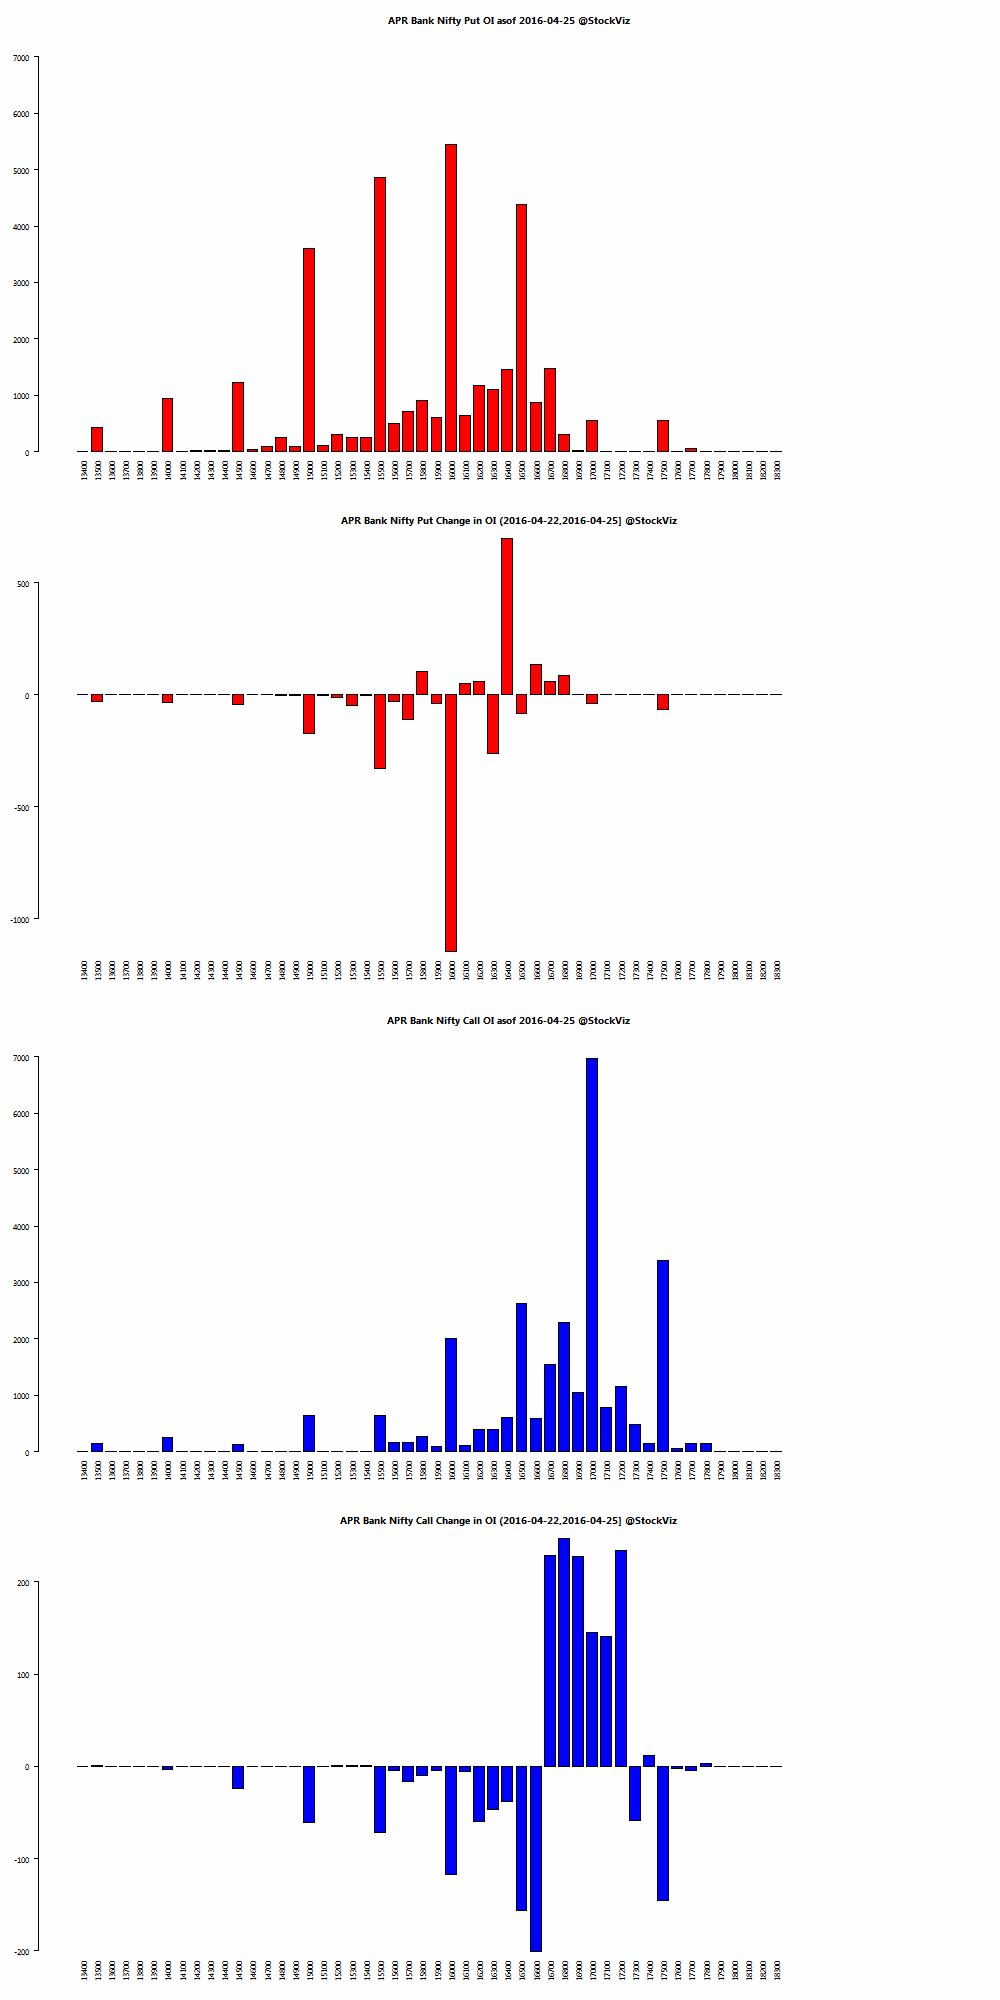 APR BANKNIFTY OI chart